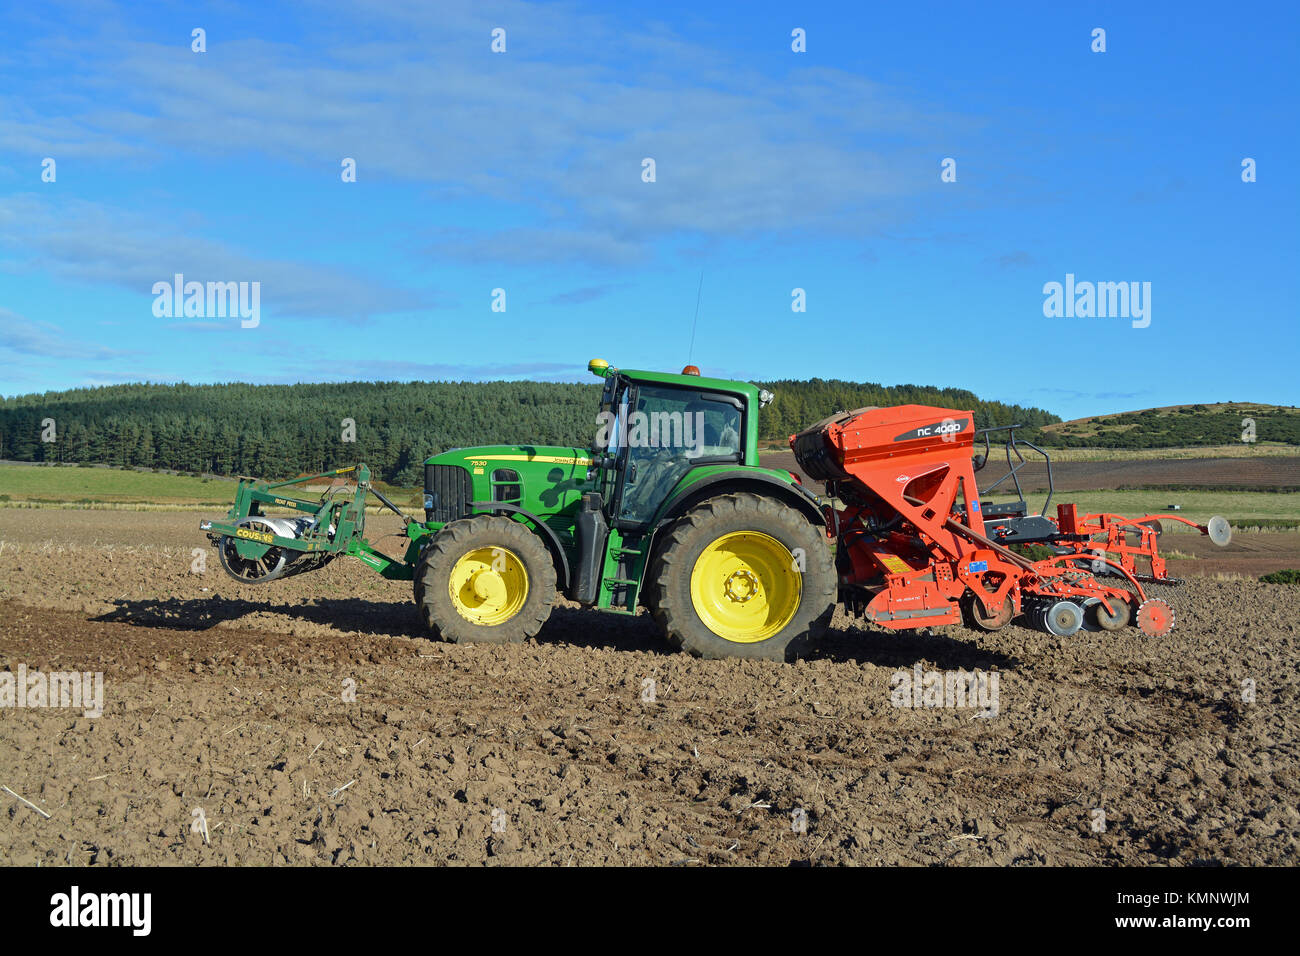 John Deere Tractor Seed Drill Stockfotos John Deere Tractor Seed